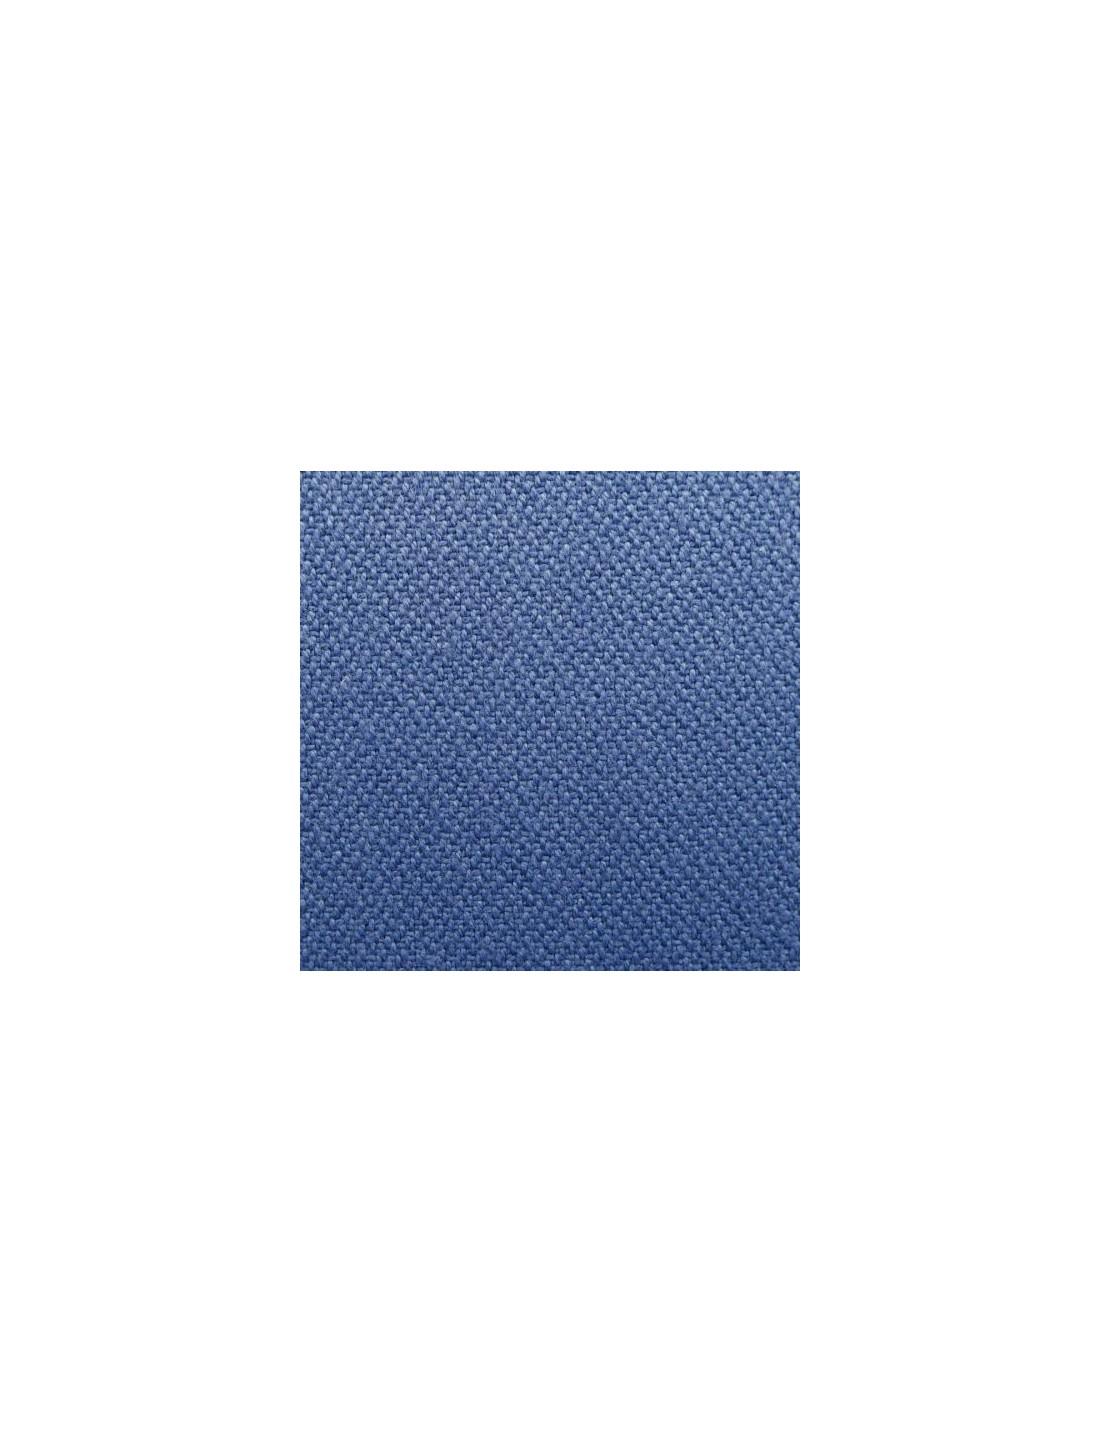 Fular Colimaçon Azul